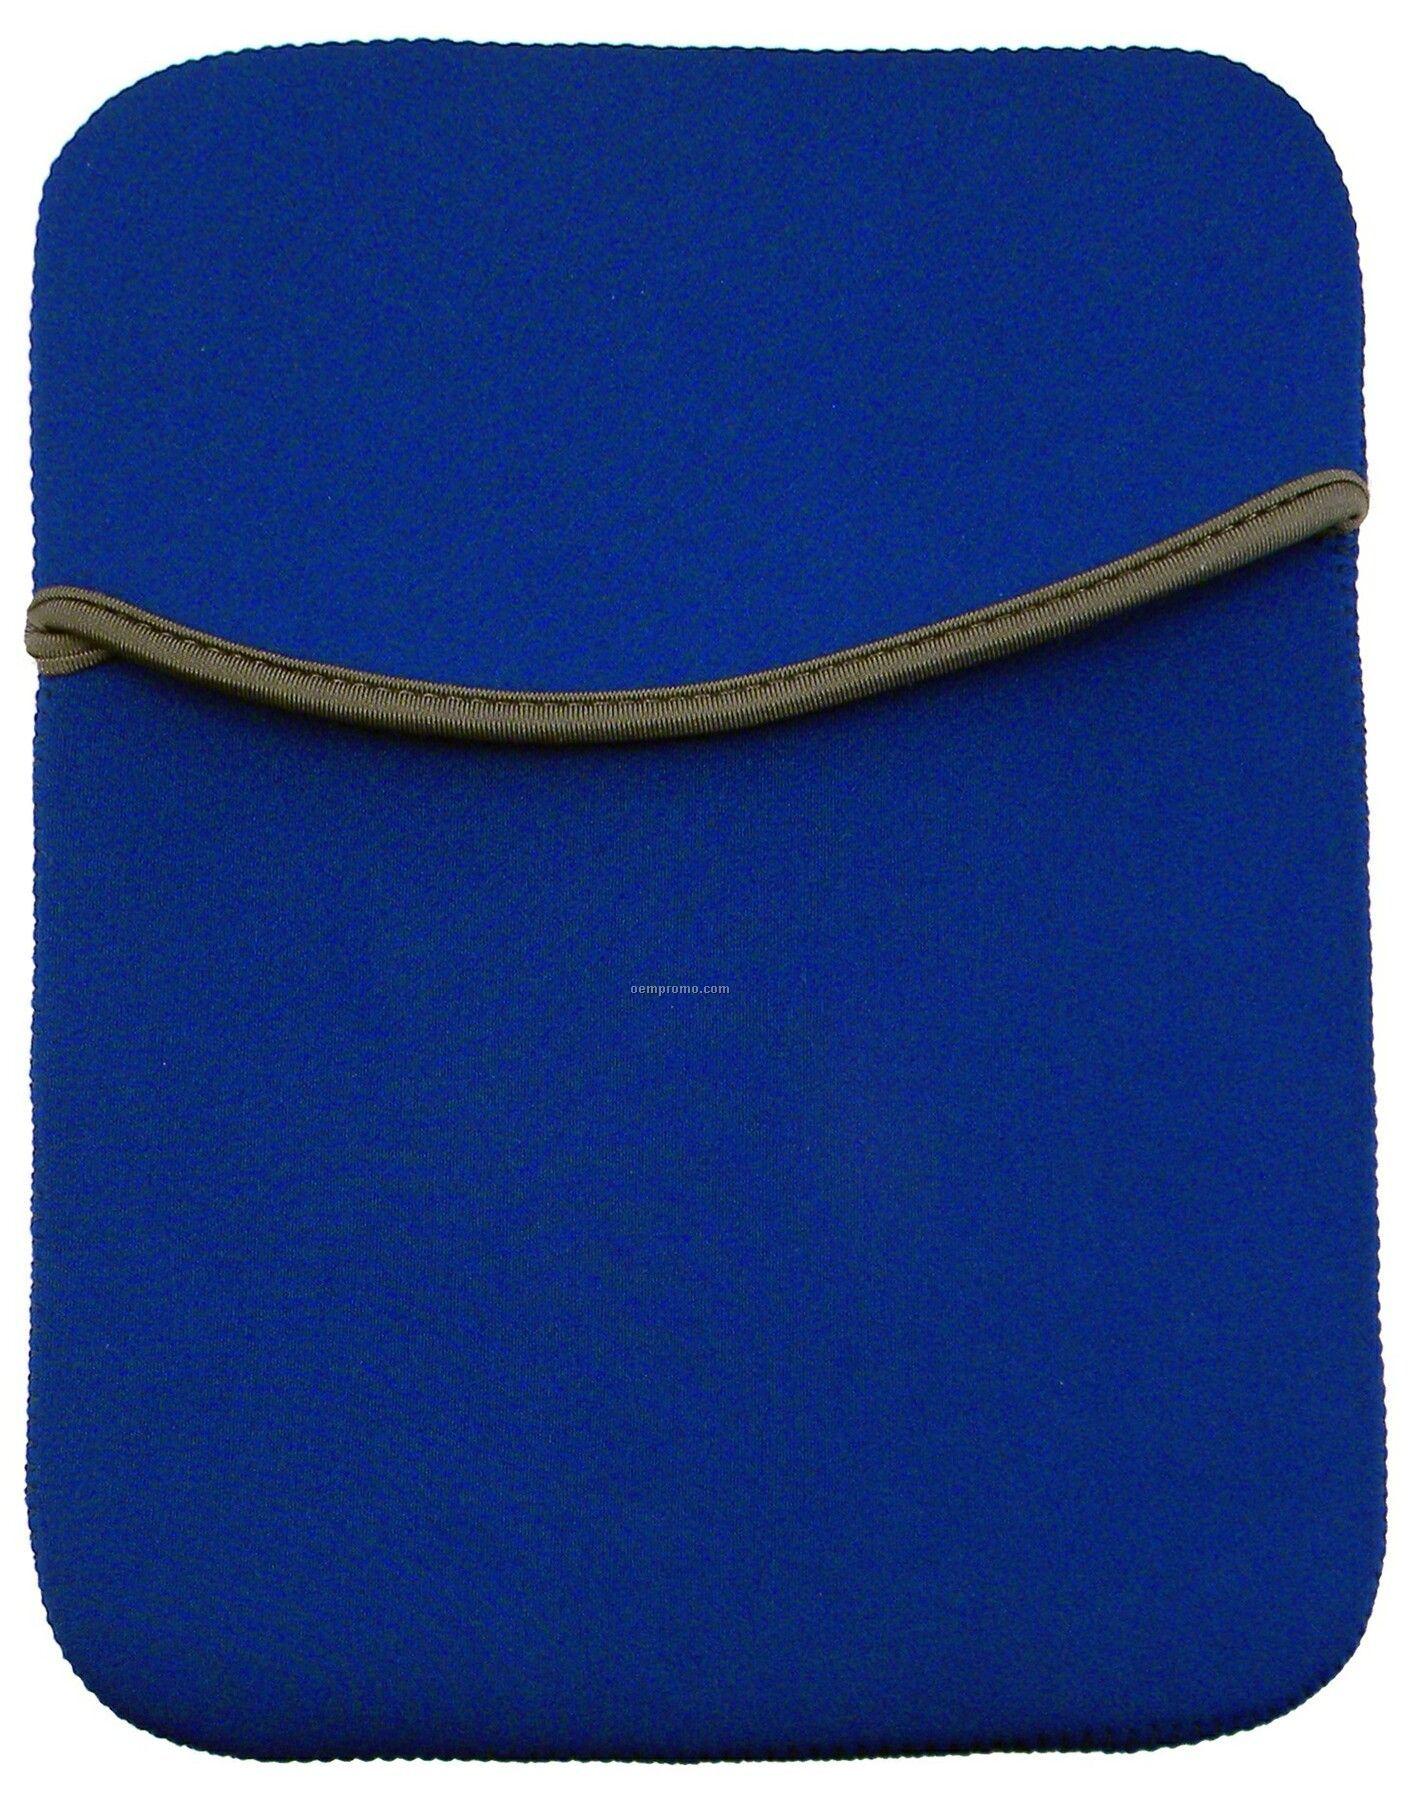 Neoprene Sleeve (Blank)